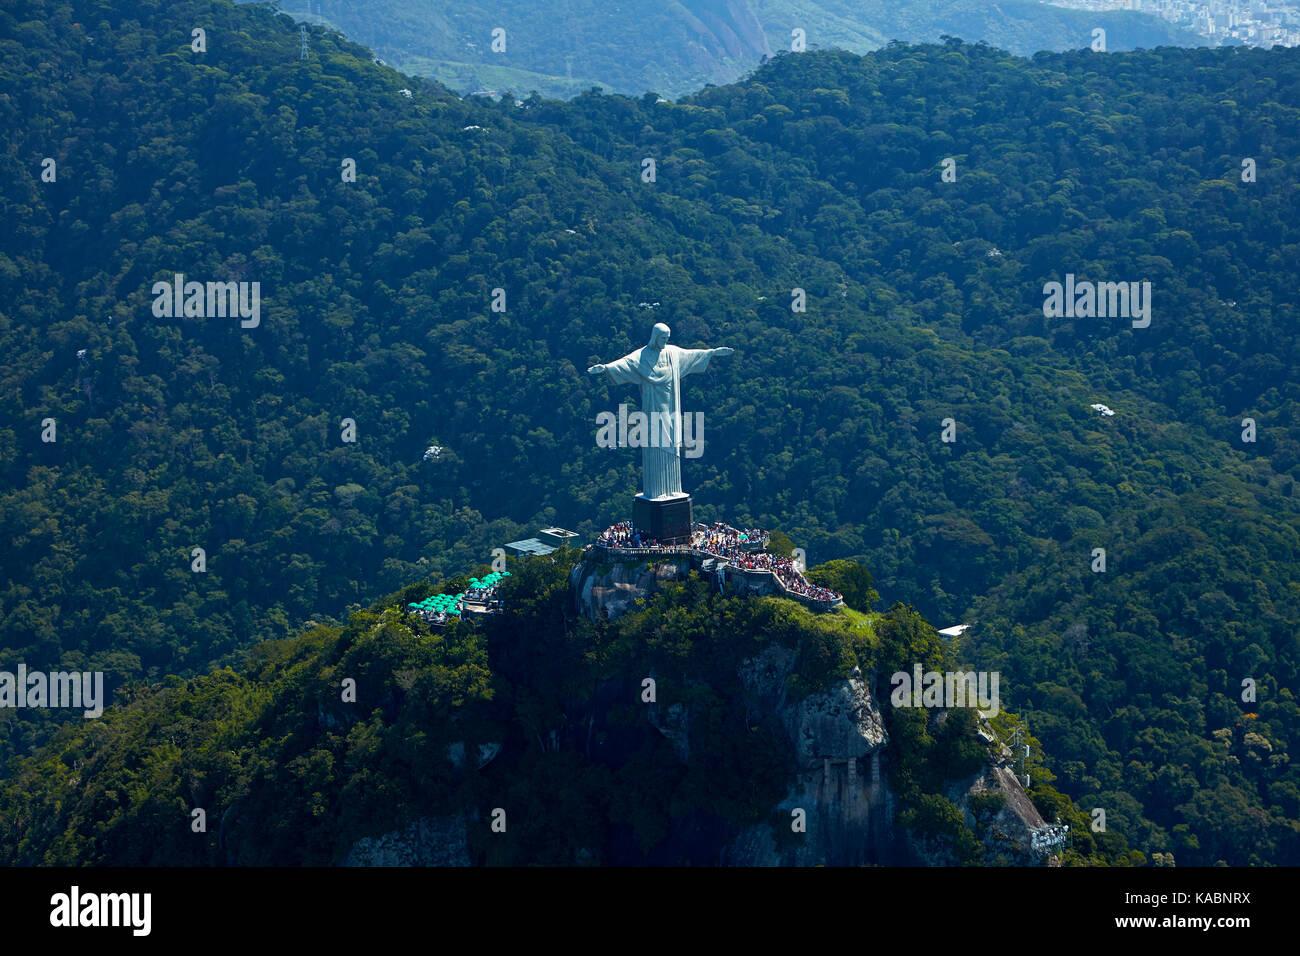 Giant statue of Christ the Redeemer atop Corcovado, Rio de Janeiro, Brazil, South America - aerial - Stock Image